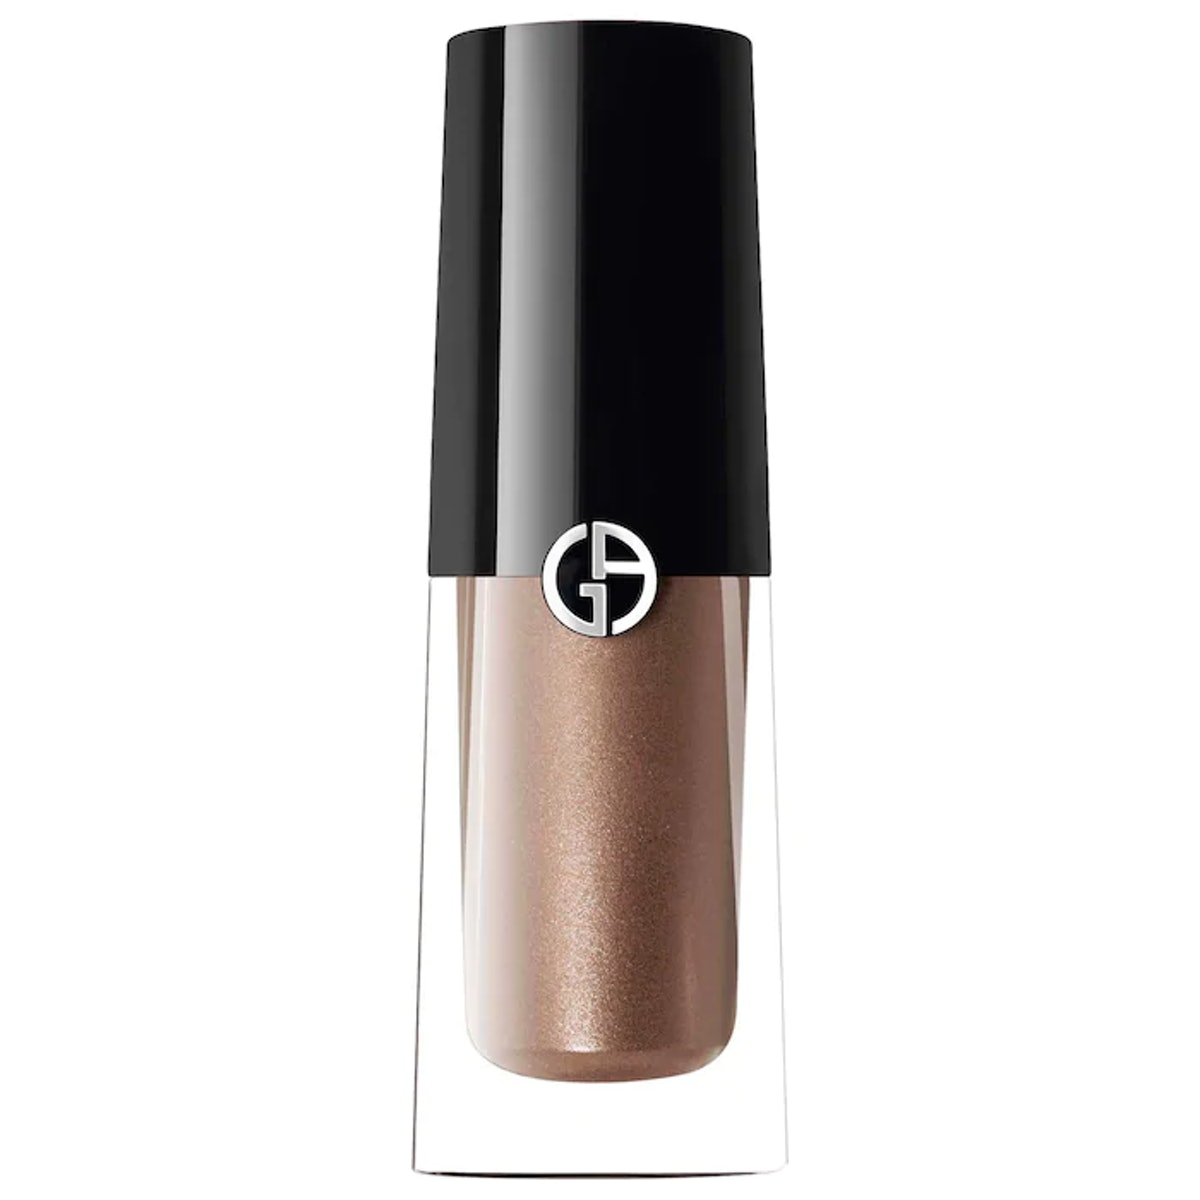 Eye Tint Long-Lasting Liquid Eyeshadow in Gold Copper